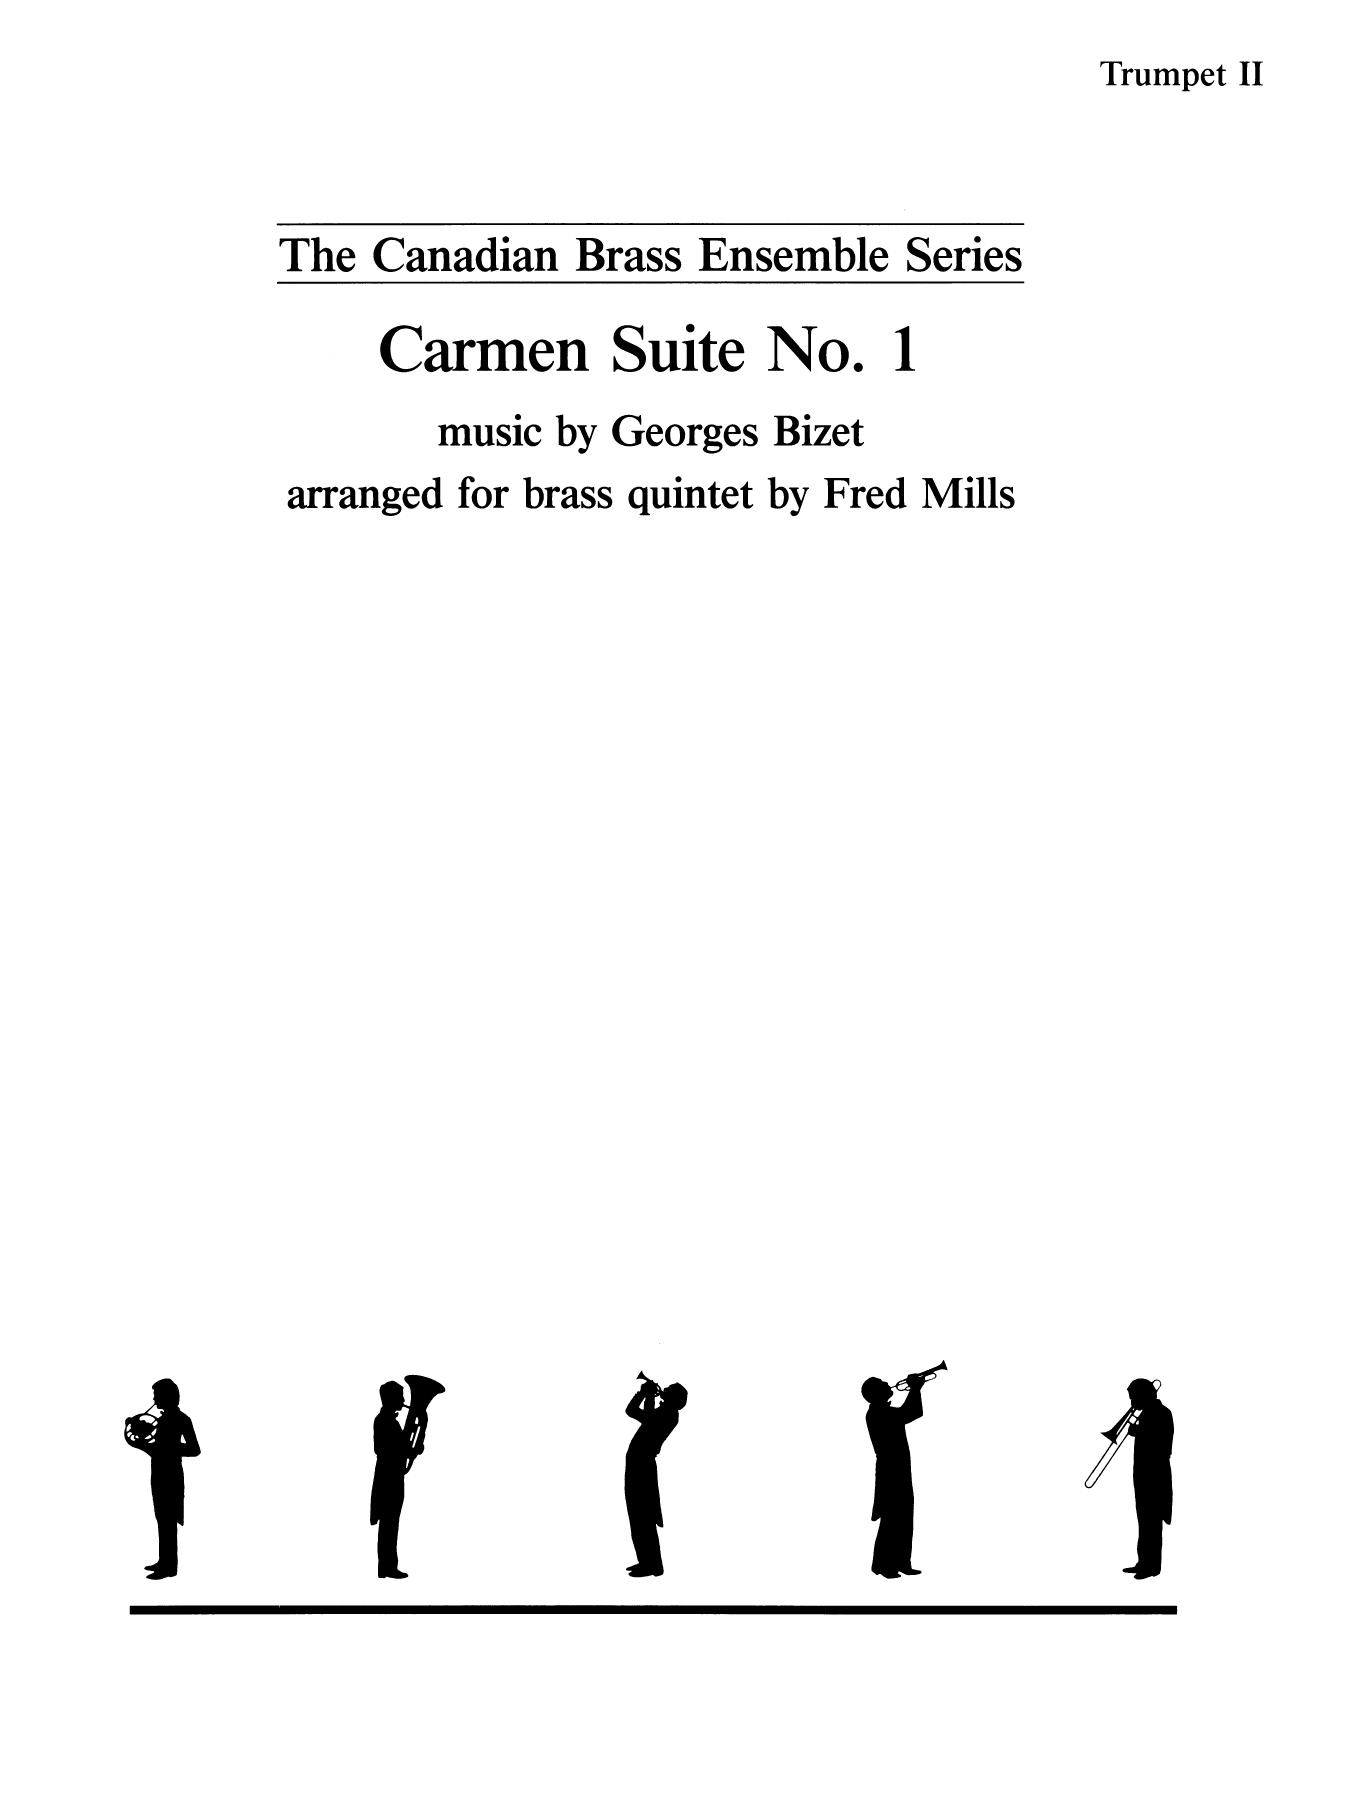 Carmen Suite No. 1 - Bb Trumpet 2 (Brass Quintet) Sheet Music